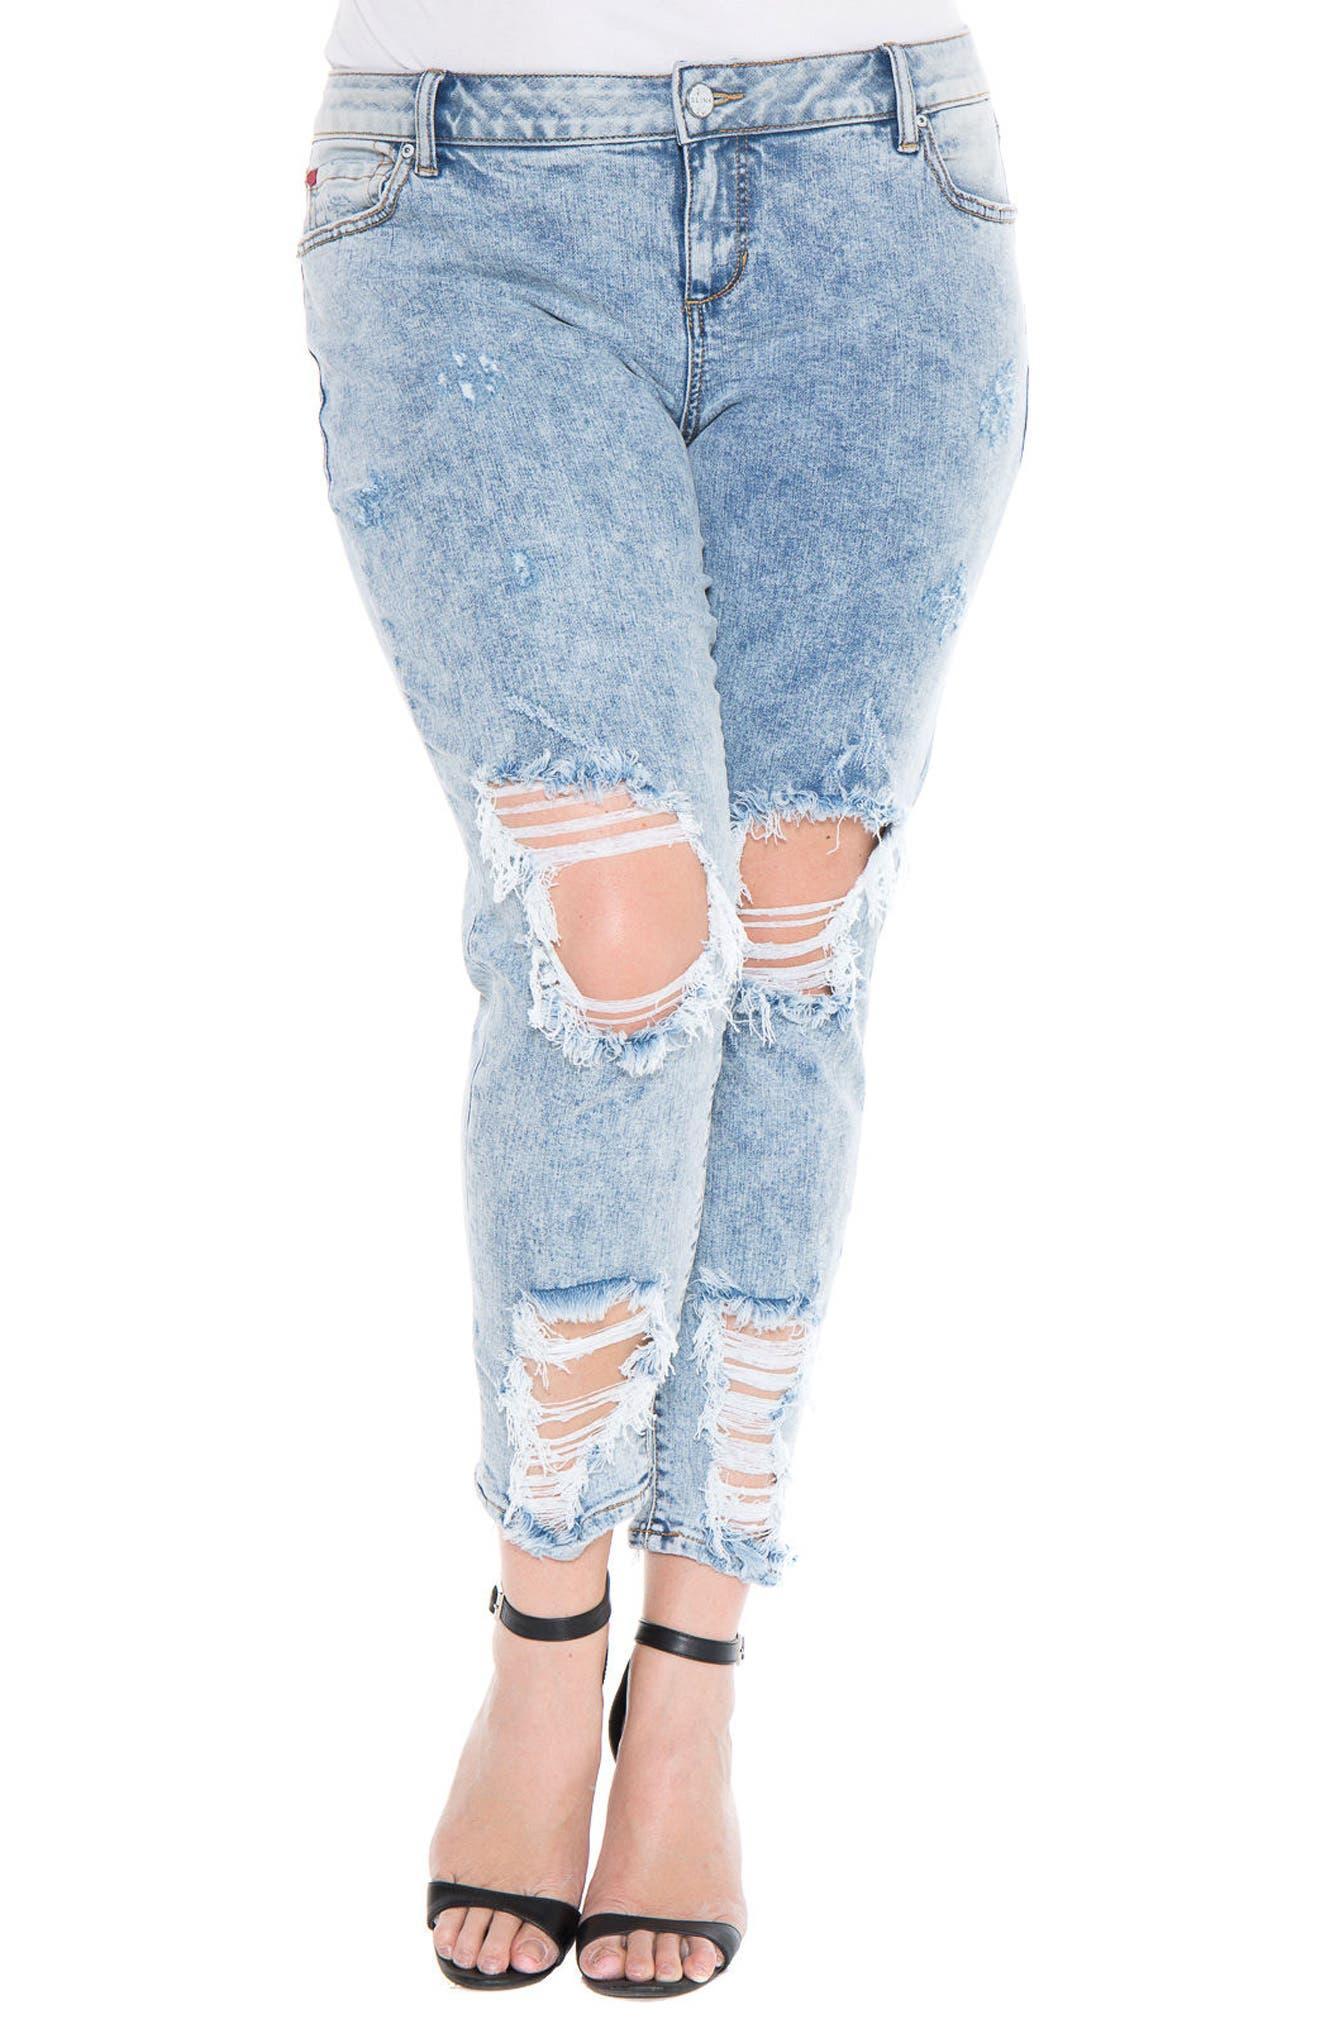 SLINK Jeans Destroyed Boyfriend Jeans (Amelia) (Plus Size)